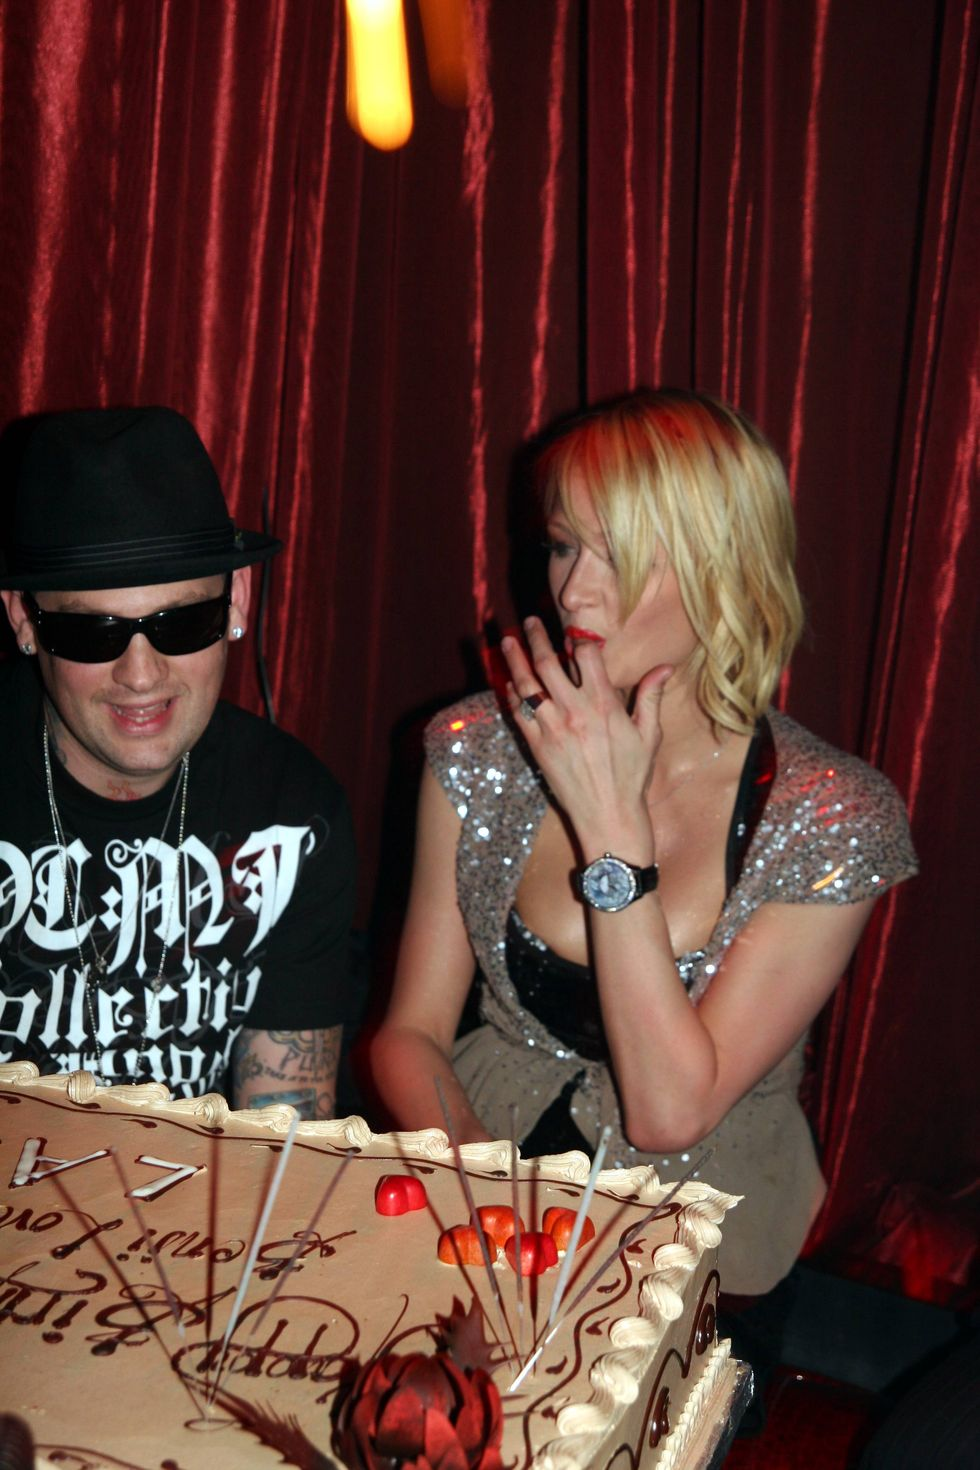 paris-hilton-at-benji-madden-birthday-party-in-las-vegas-01